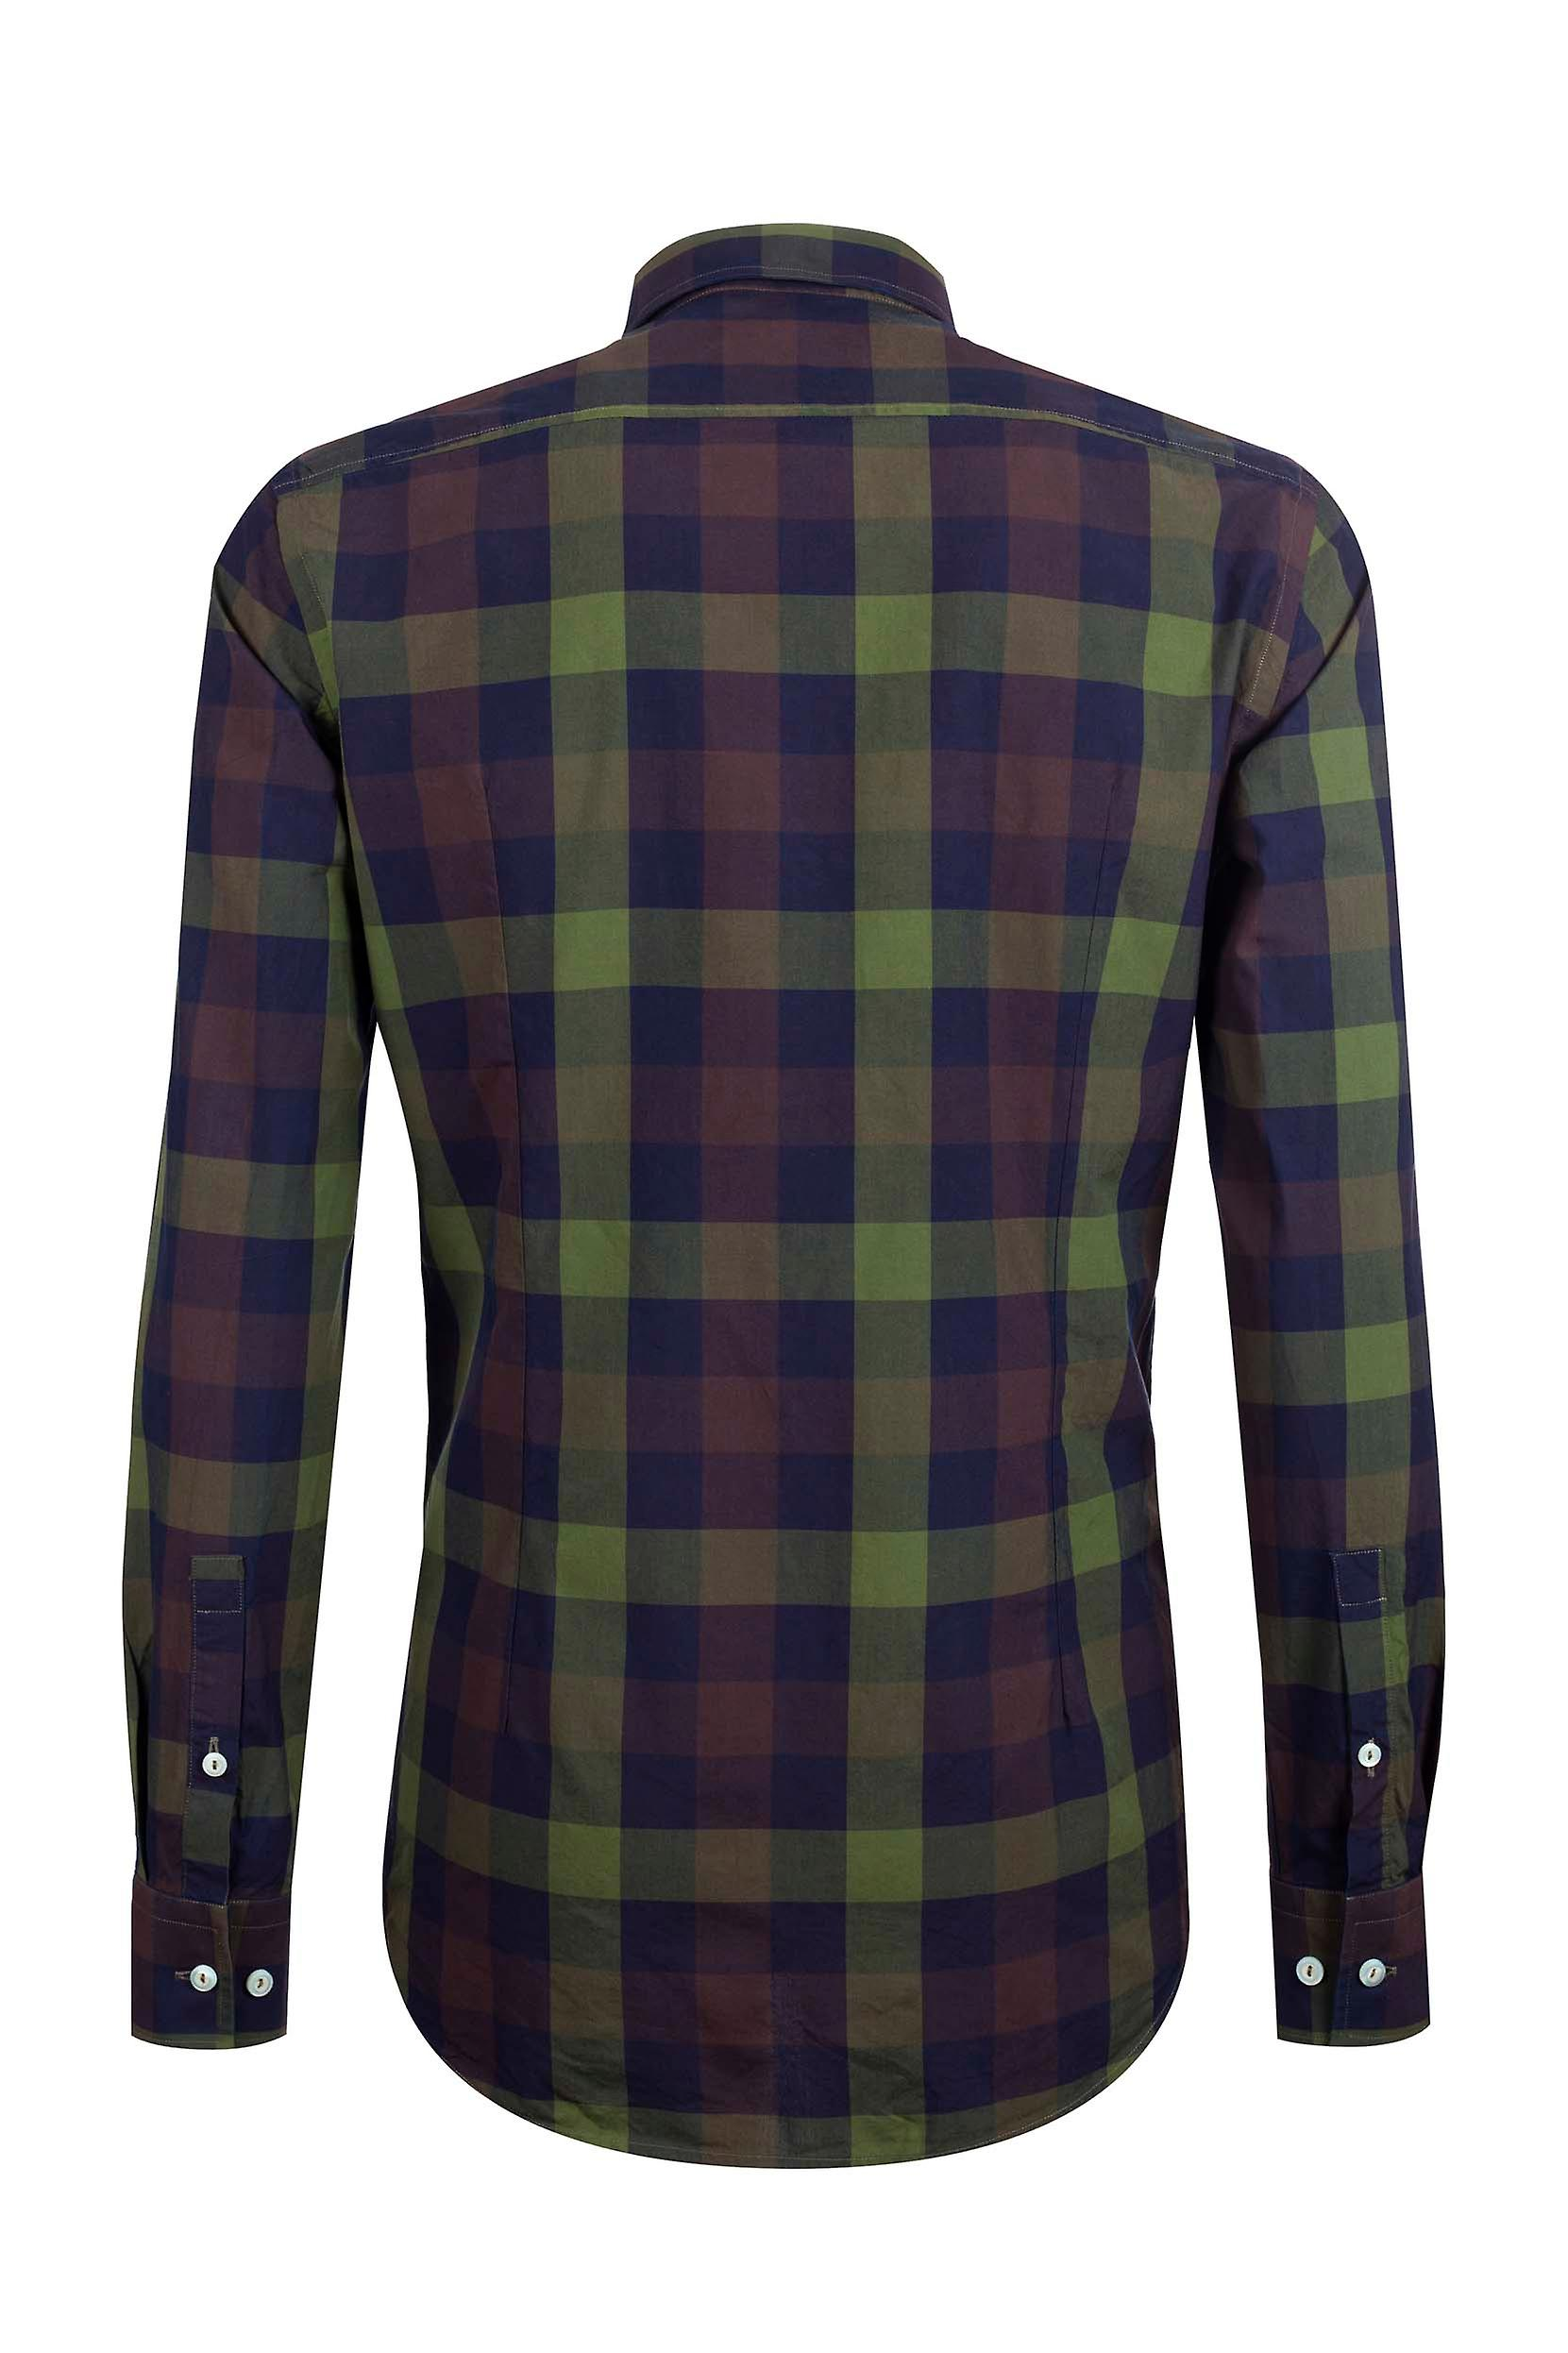 Fabio Giovanni San Martino Shirt - Mens High Quality Italian Poplin Cotton Multicoloured Check Shirt